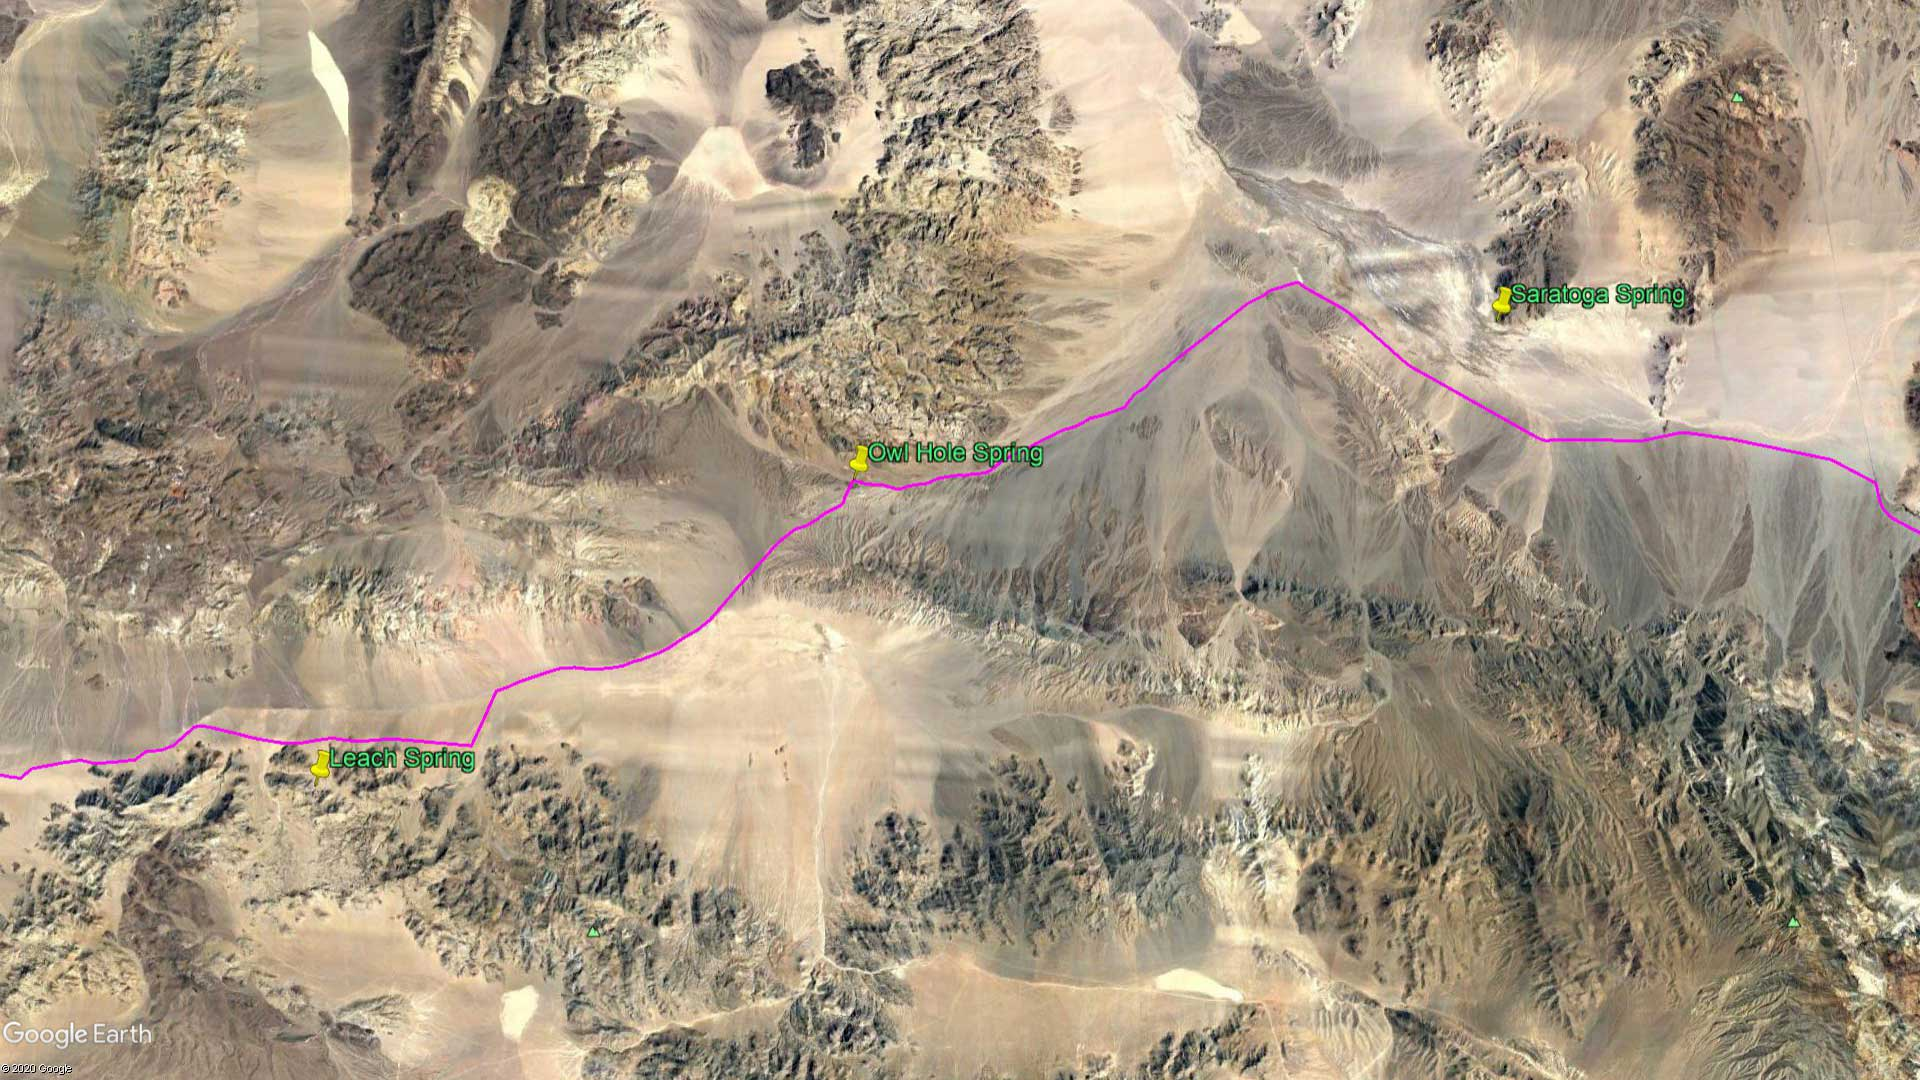 April 6, 1870 - The Mojave Desert